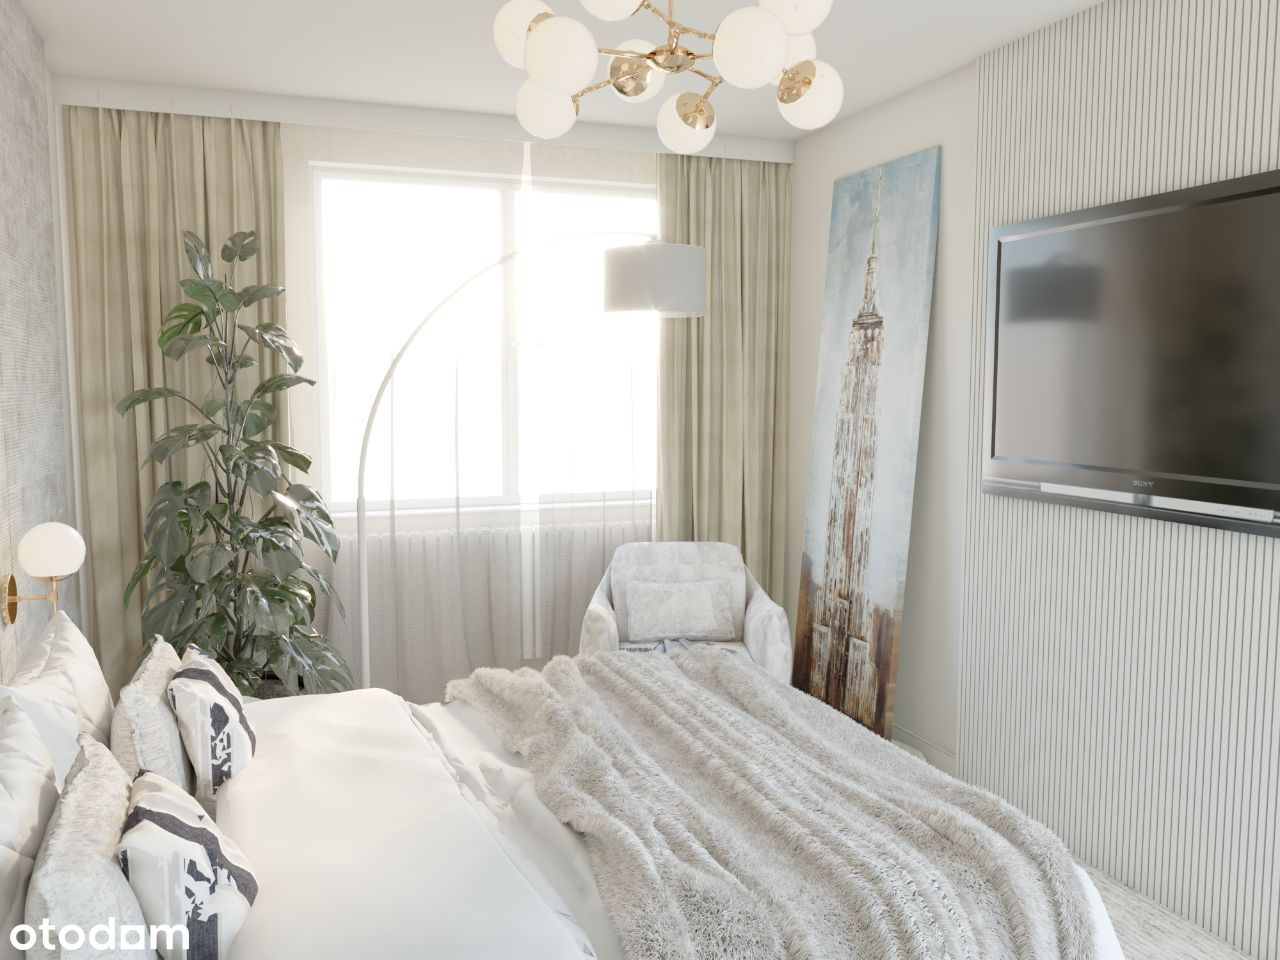 Mieszkanie 3 pokoje promocyjna cena do końca mies.